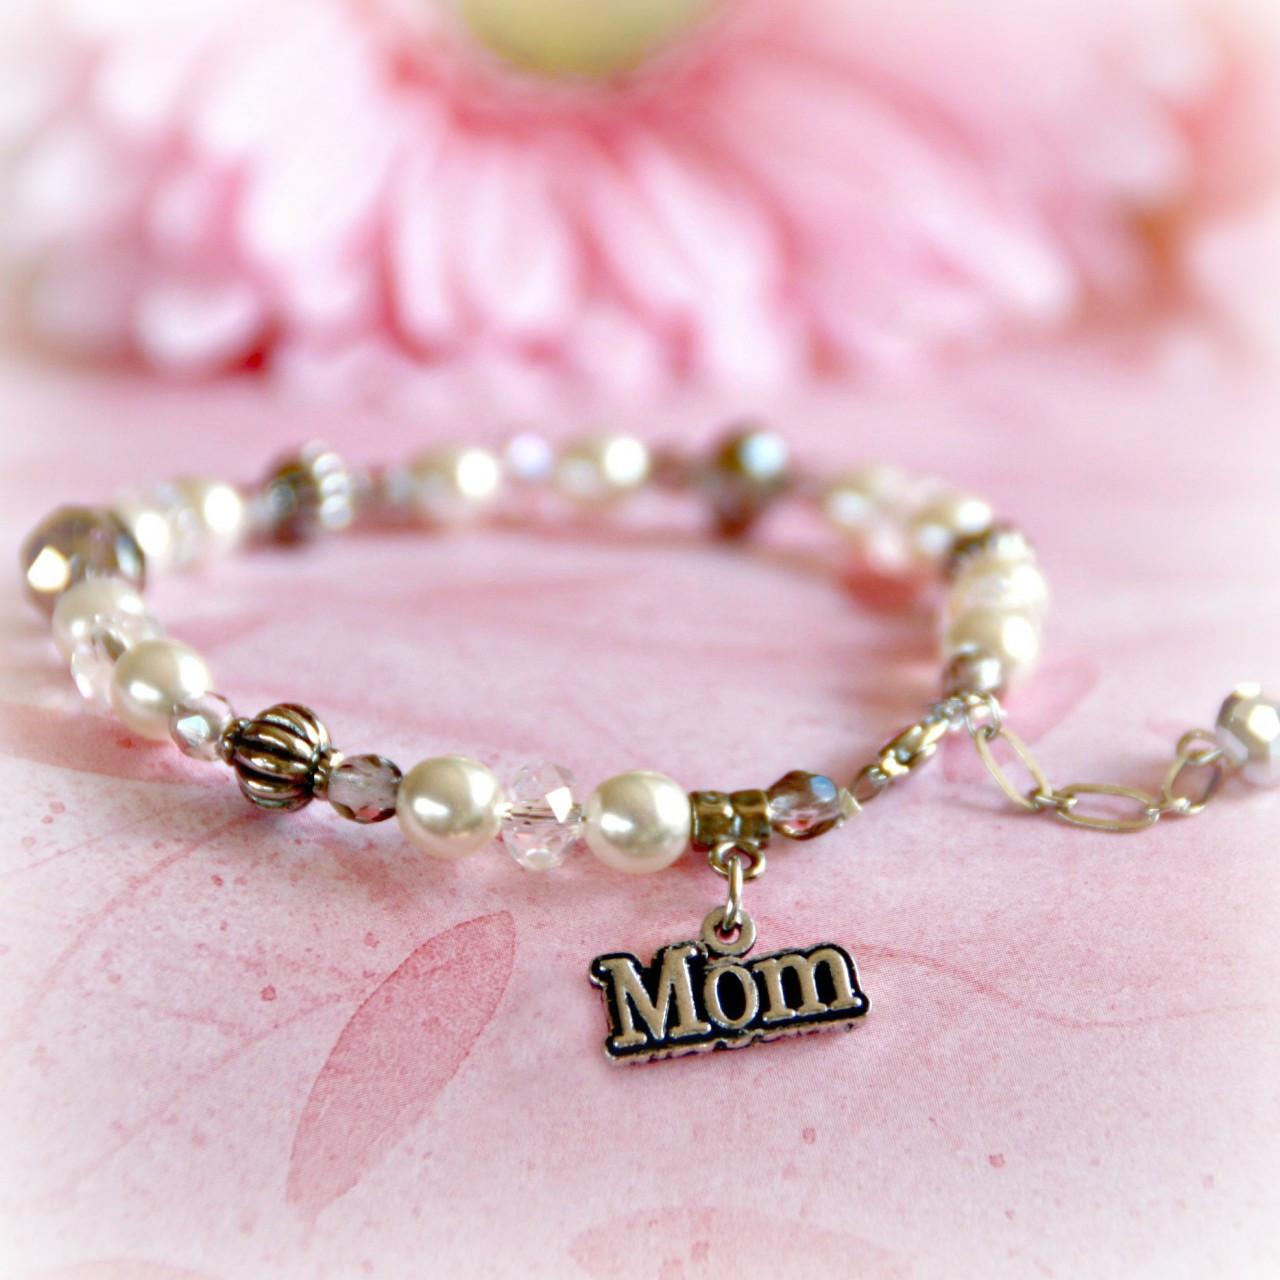 IN-349 Mother MOM charm Pearl Bracelet